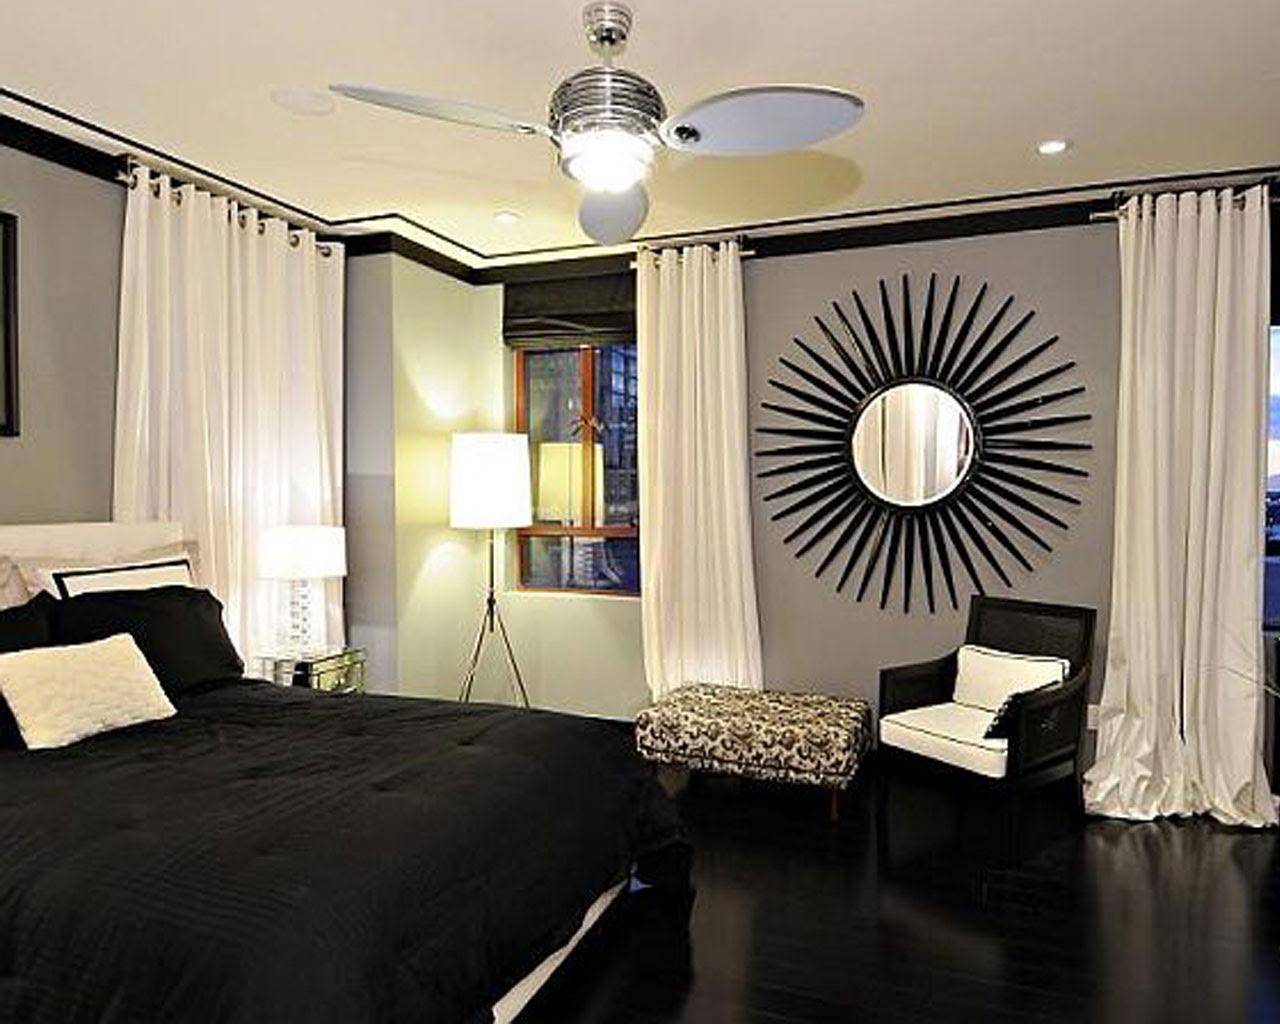 bedroom  design  ideas  of 2014 18 Interior Design  Center